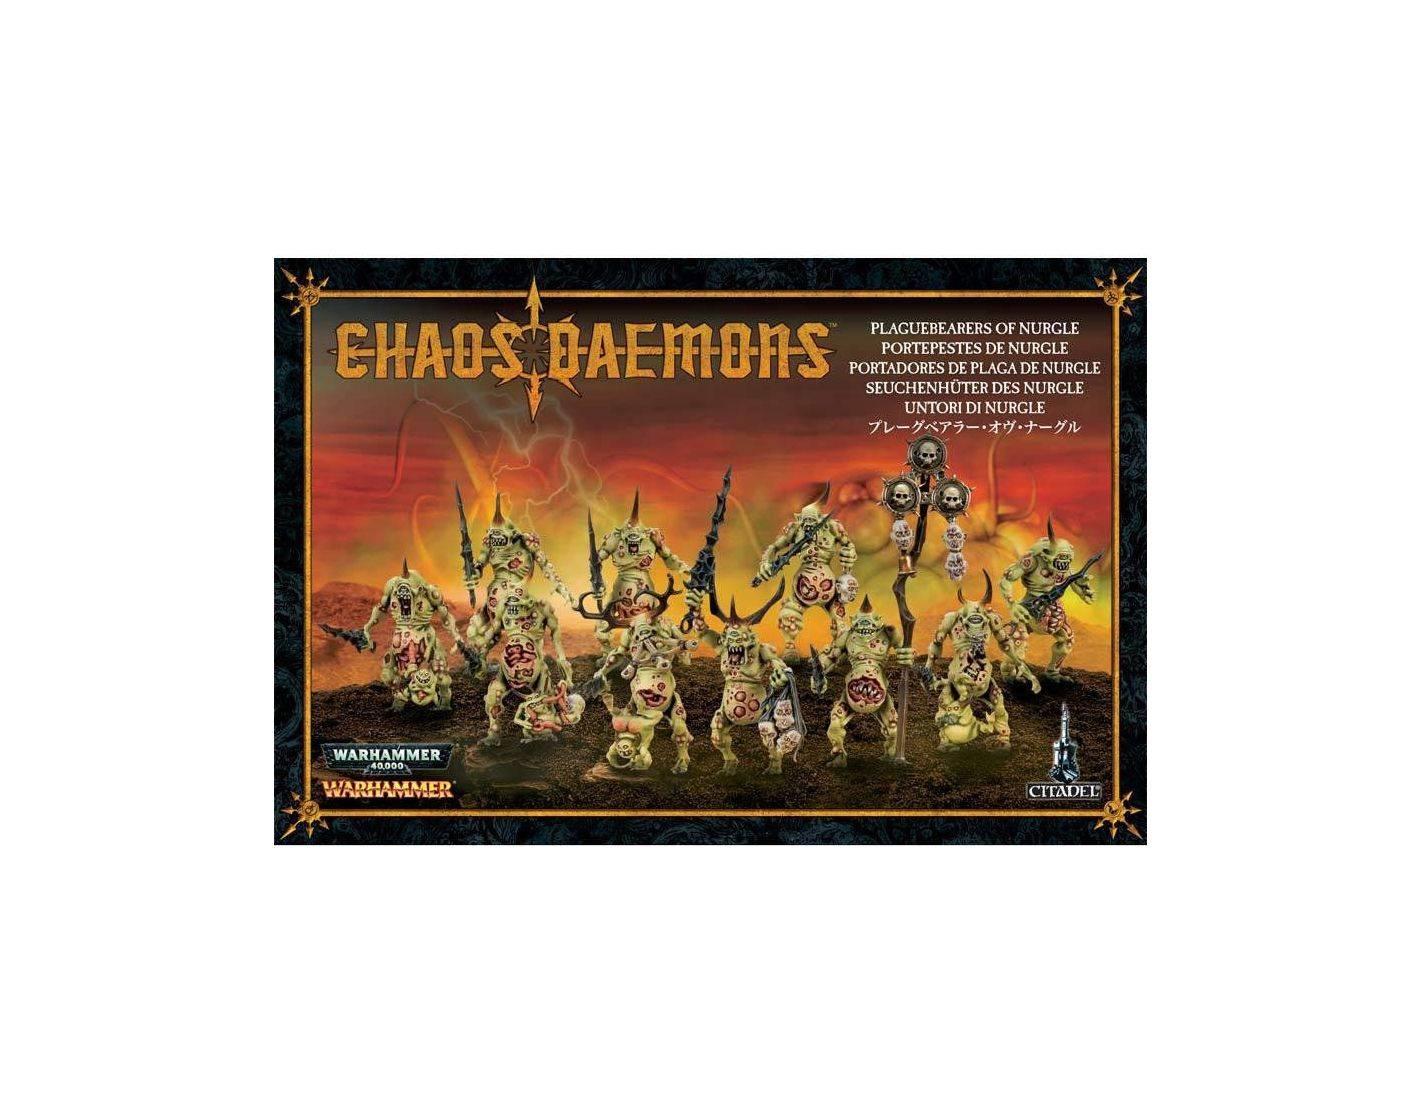 Games Workshop Warhammer 97-10 UNTORI DI NURGLE Personaggi